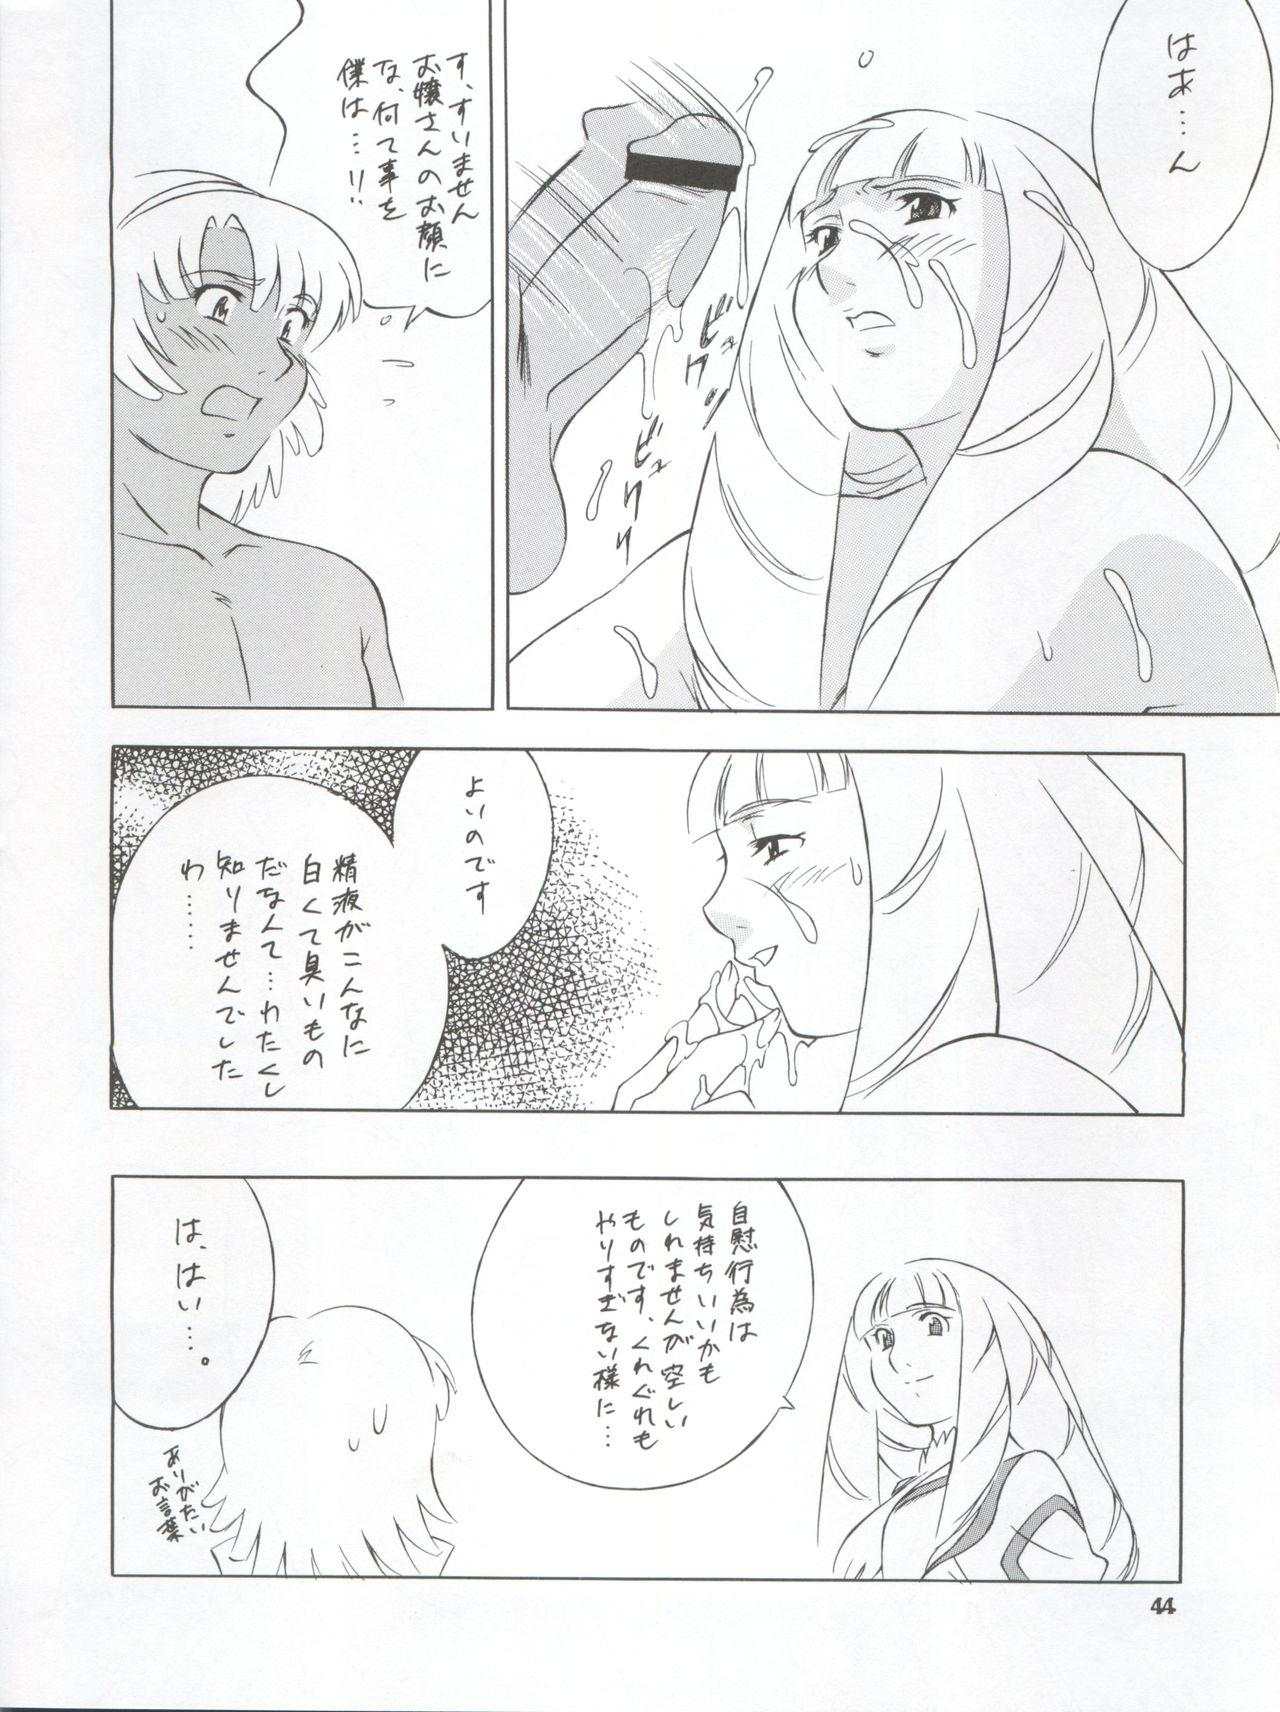 NEXT Climax Magazine 3 Gundam Series 43